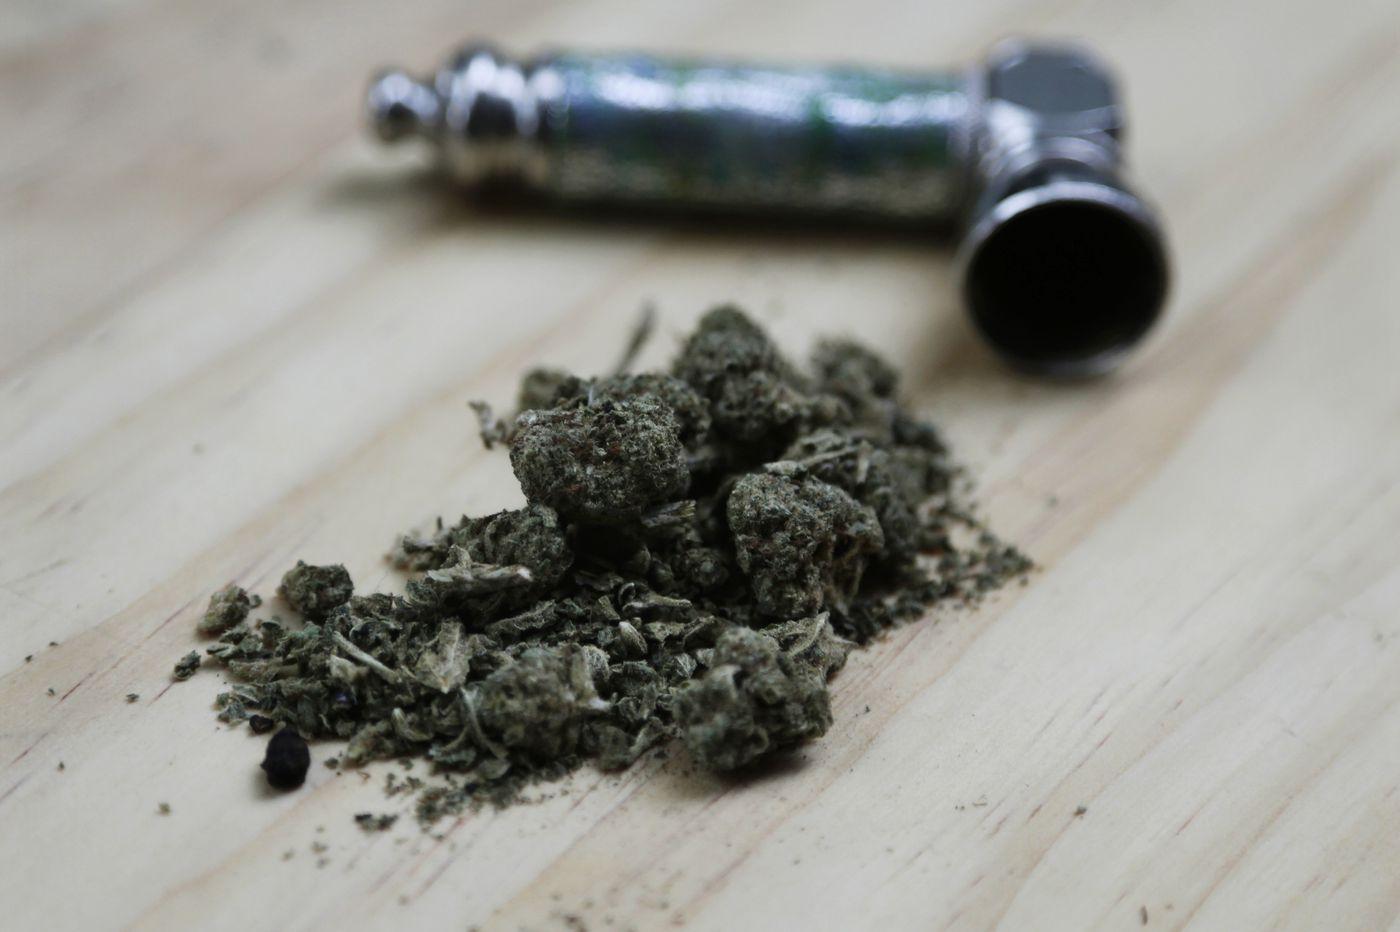 Majority of New Jersey residents favor legalizing recreational marijuana, poll shows